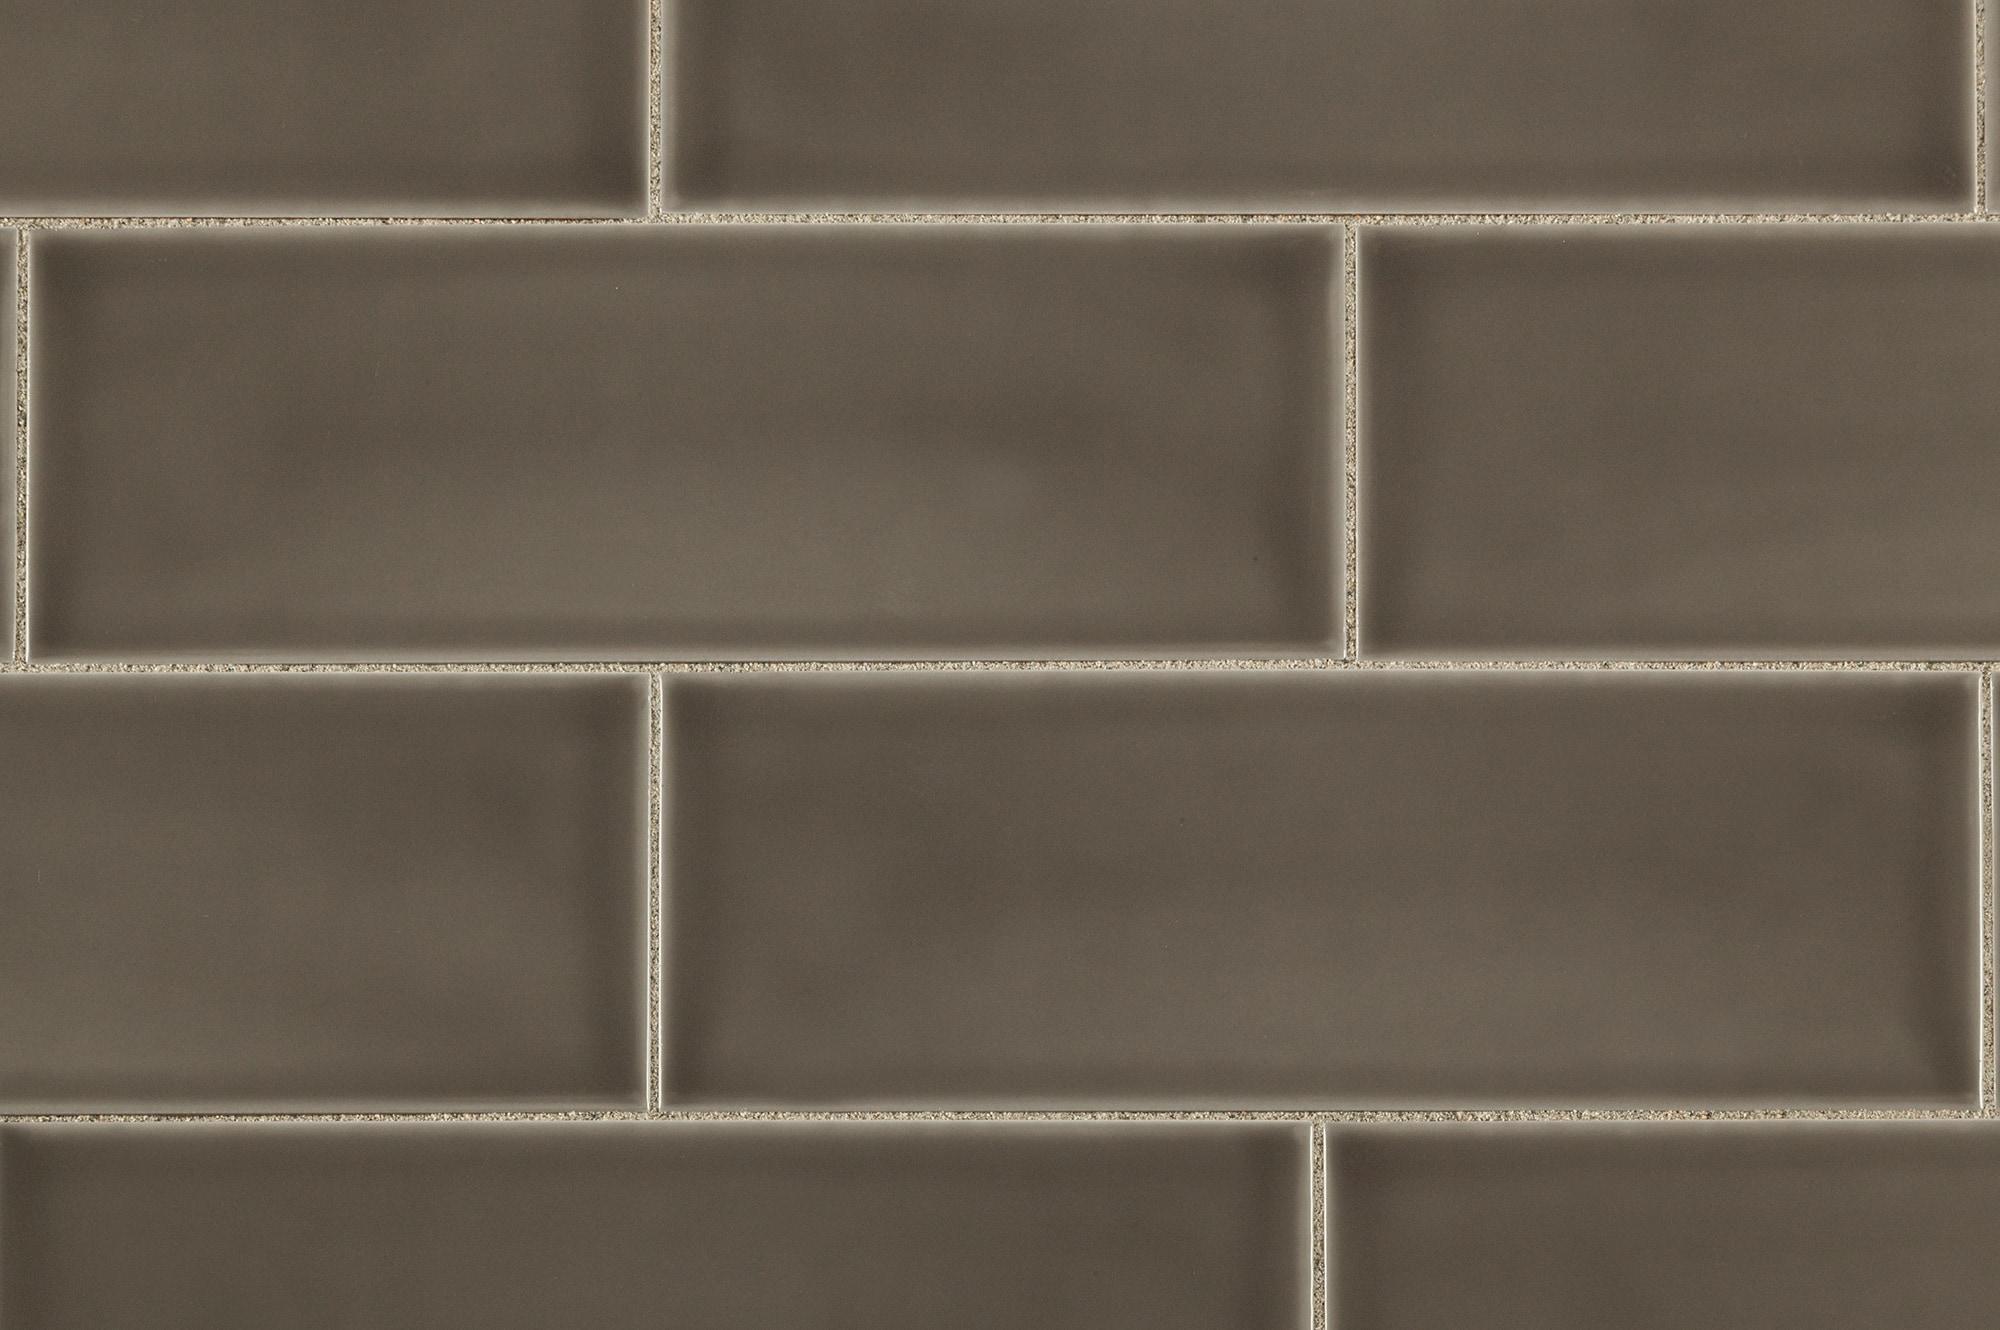 Brilliante Ceramic Wall Tile Provence Collection Gray Beige 4 X12